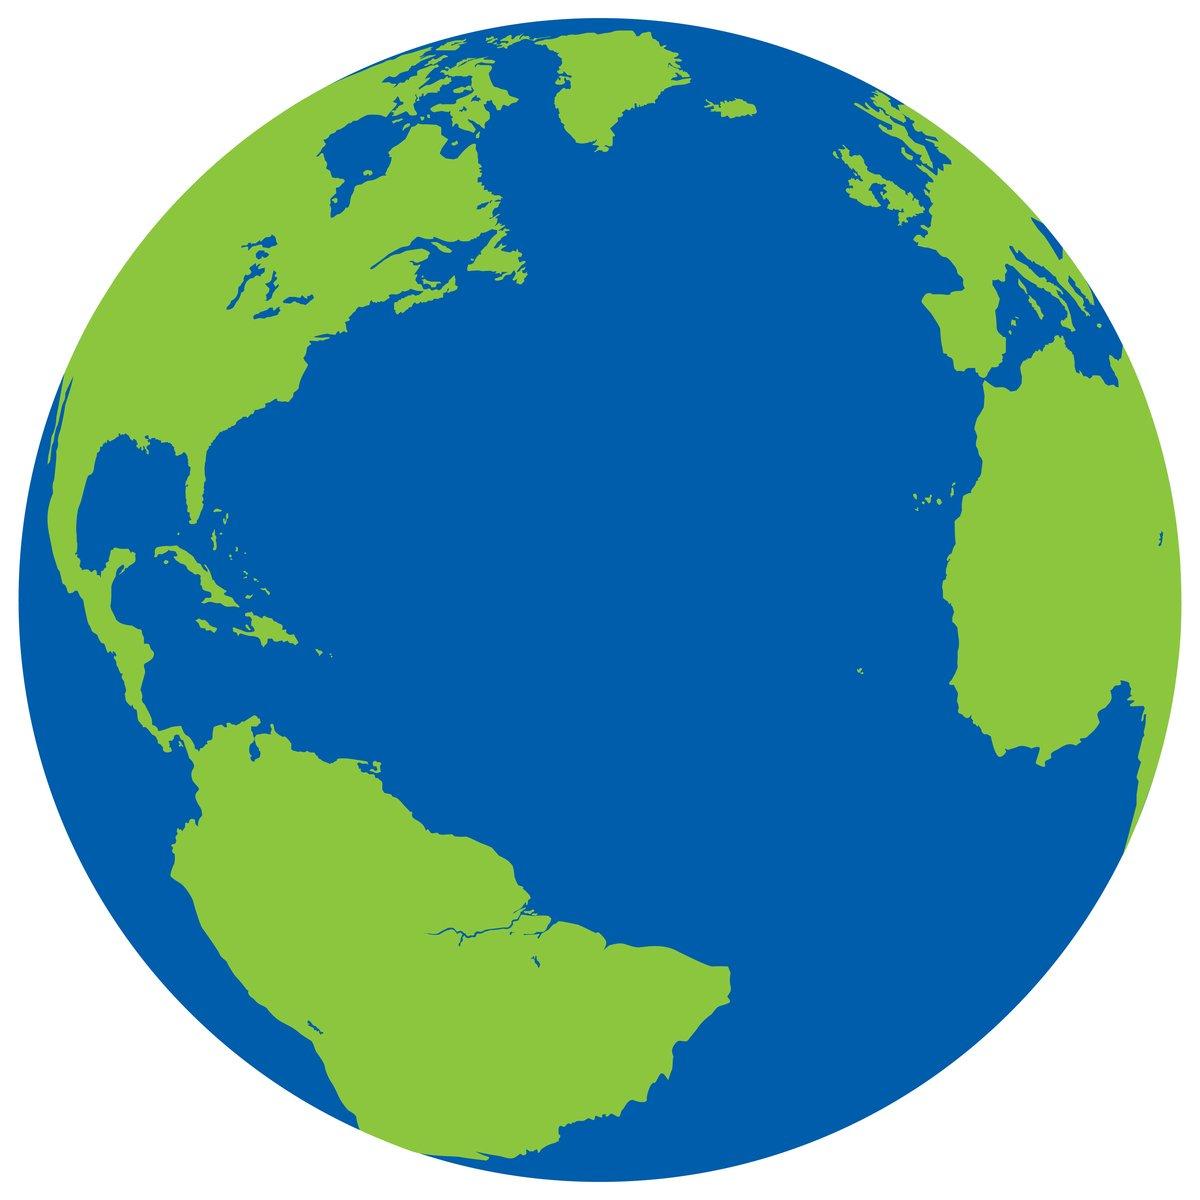 Free Planète Terre Stock Photo.